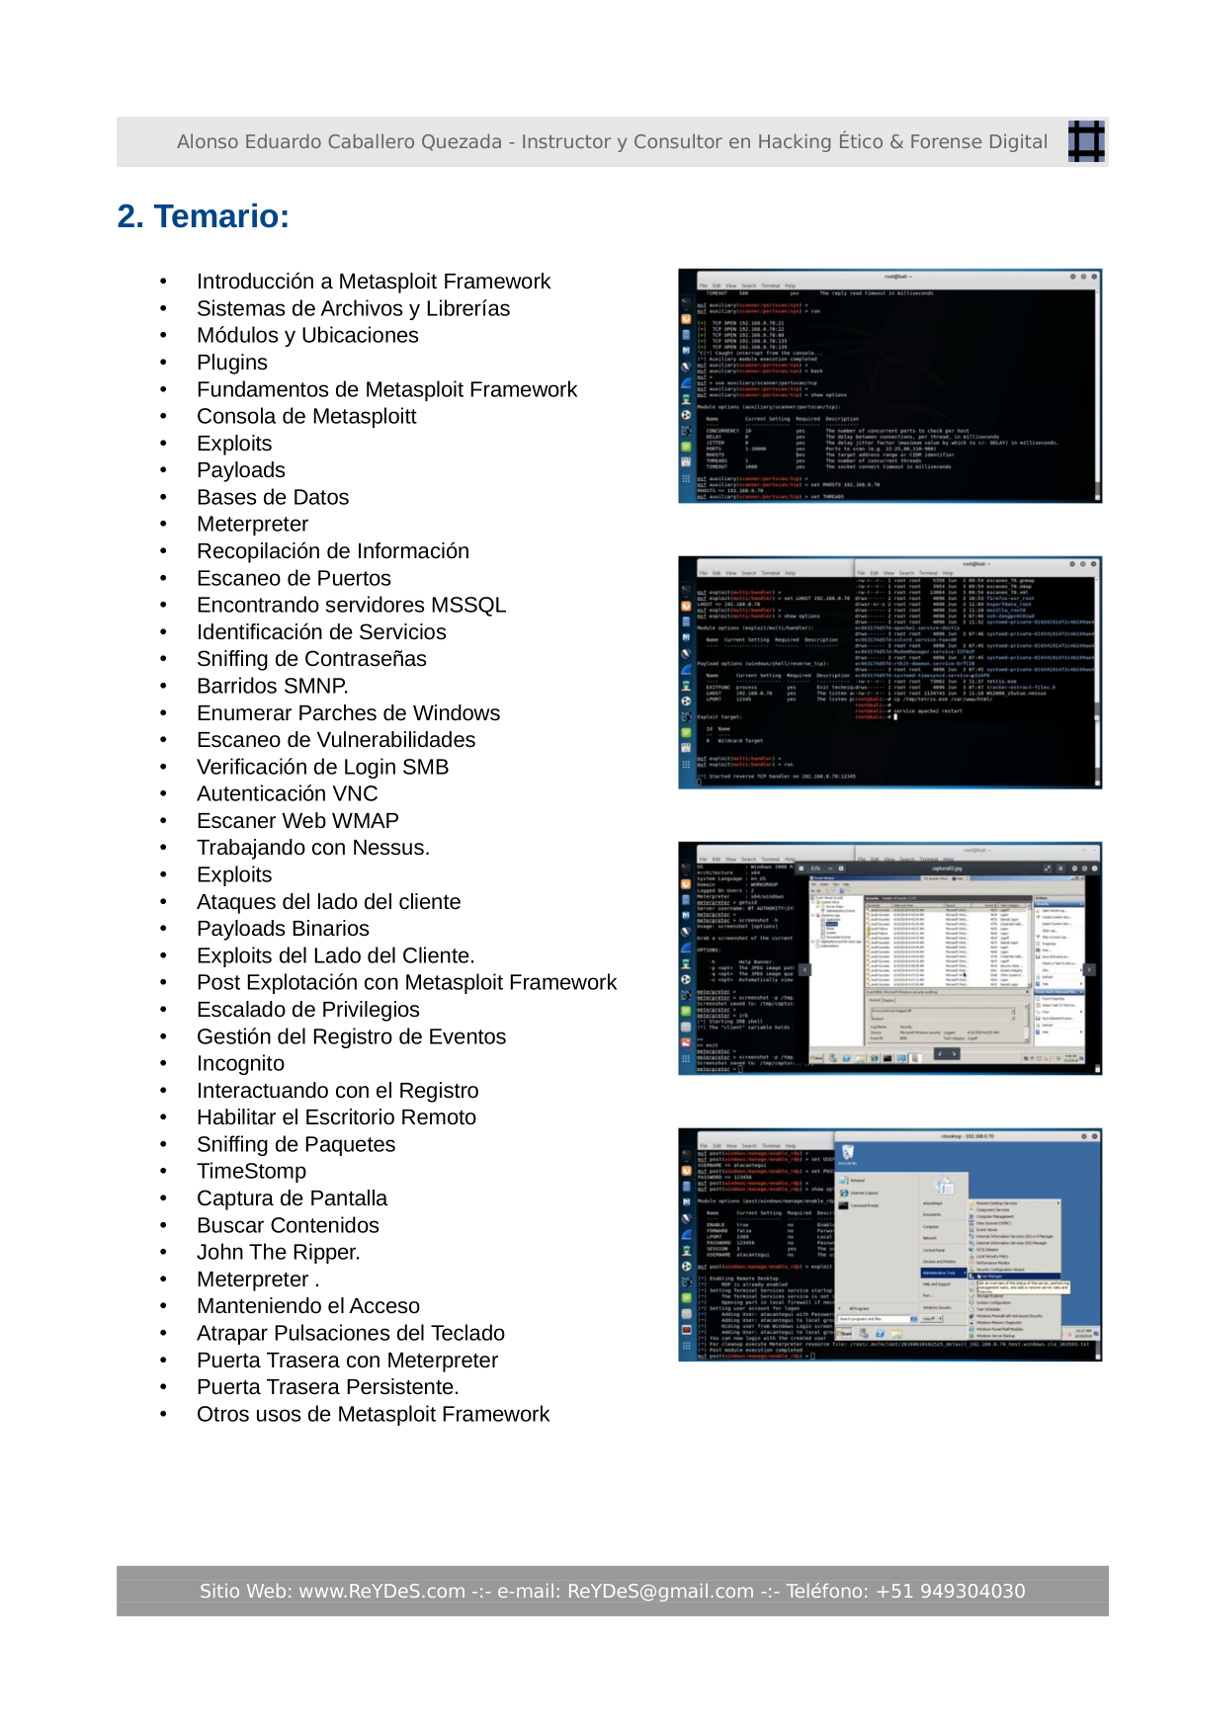 Único Curso Virtual Metasploit Framework 2019